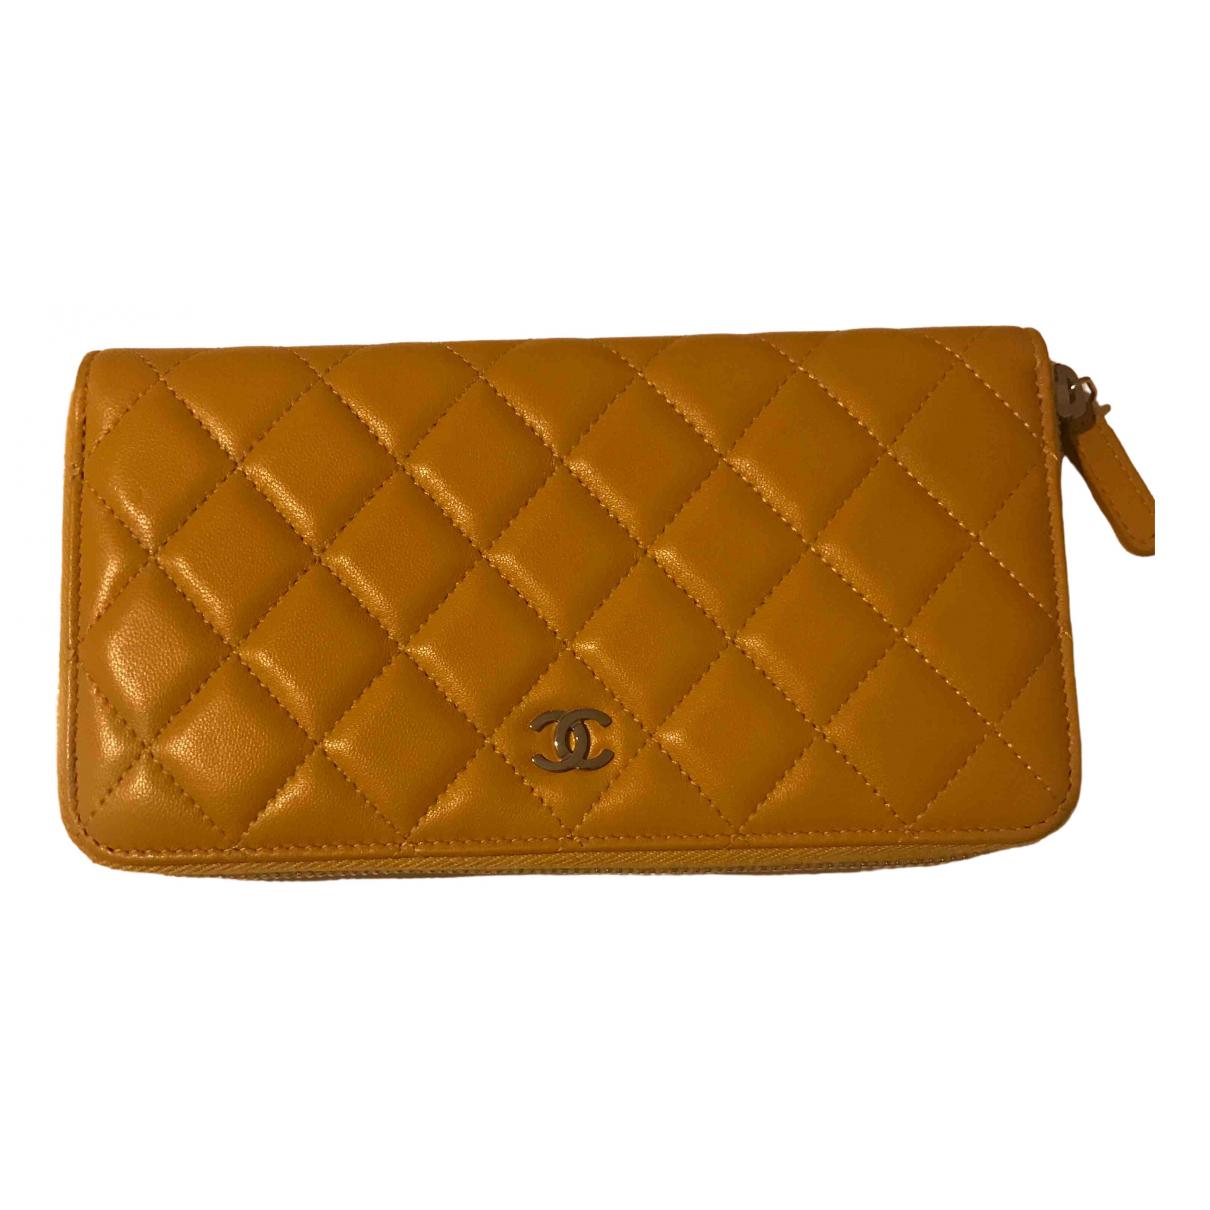 Chanel Timeless/Classique Portemonnaie in  Gelb Leder